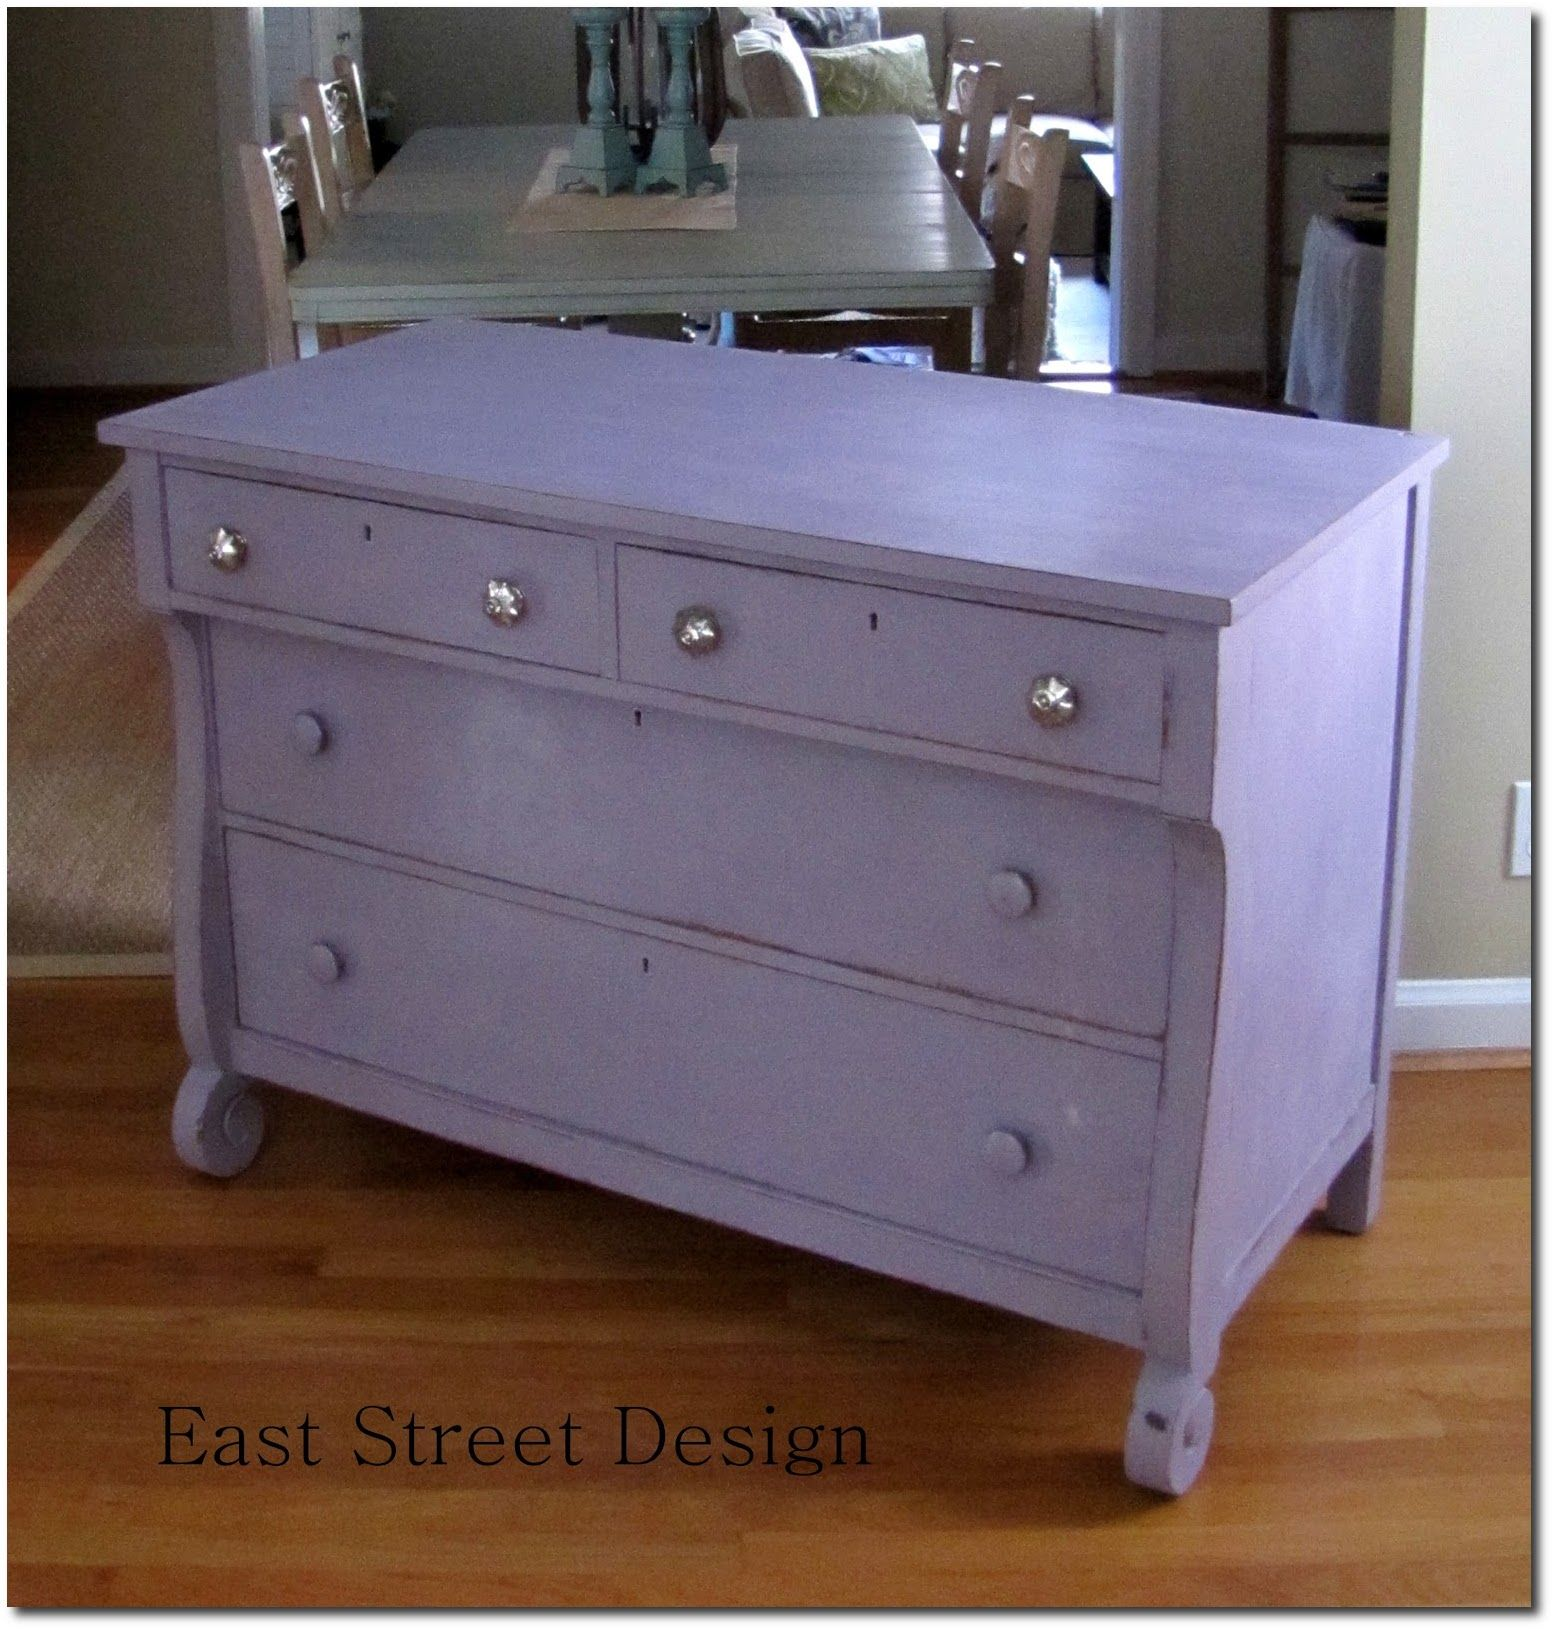 painted furniture blogsPainted dresser in Annie Sloan chalk paint Henrietta Knobs from